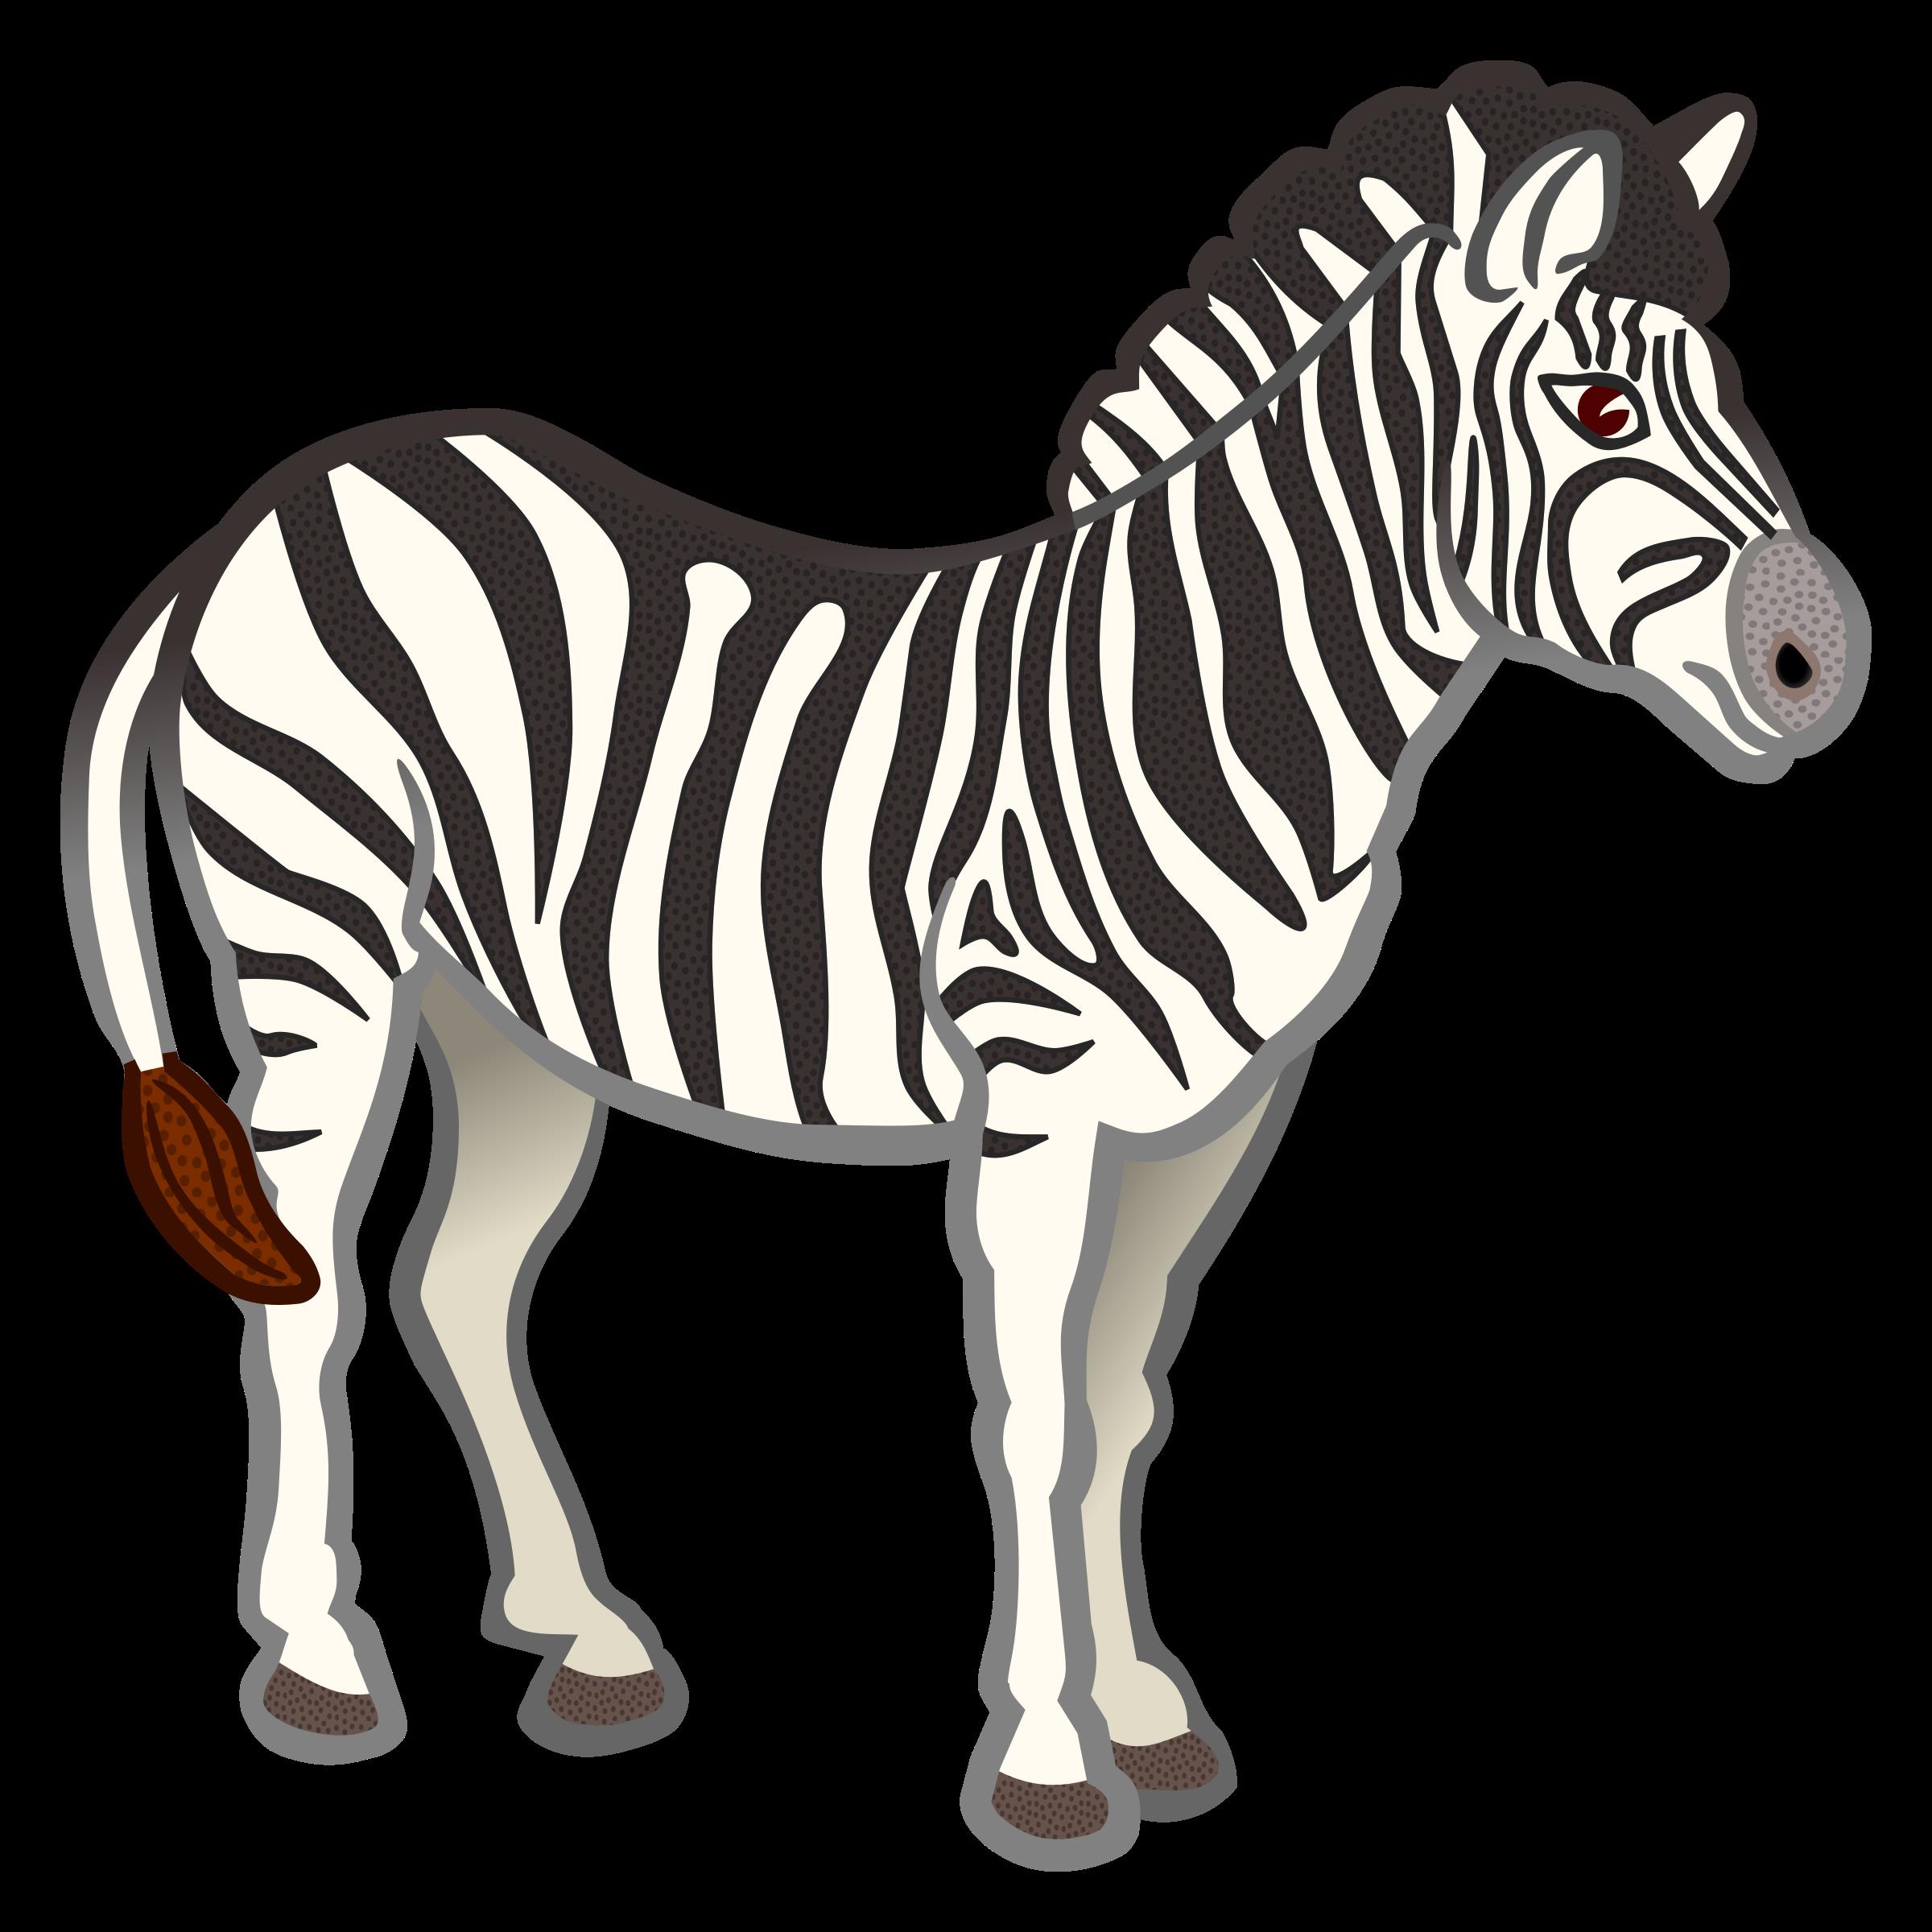 Zebrq clipart clip art freeuse Zebra clipart zebraclipart zebra animals clip art 2 3 ... clip art freeuse